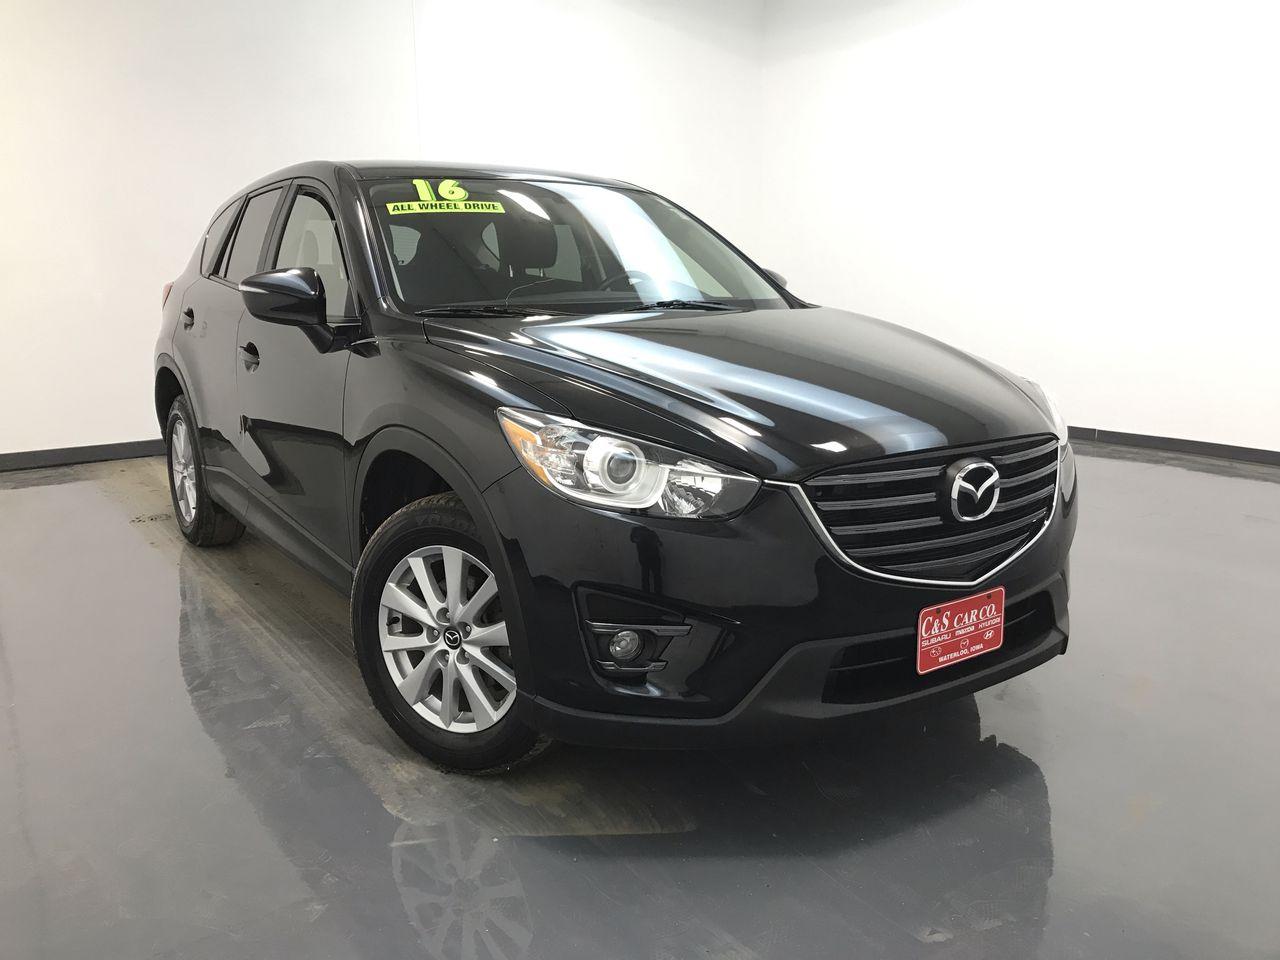 2016 Mazda CX-5 Touring  - HY8260A  - C & S Car Company